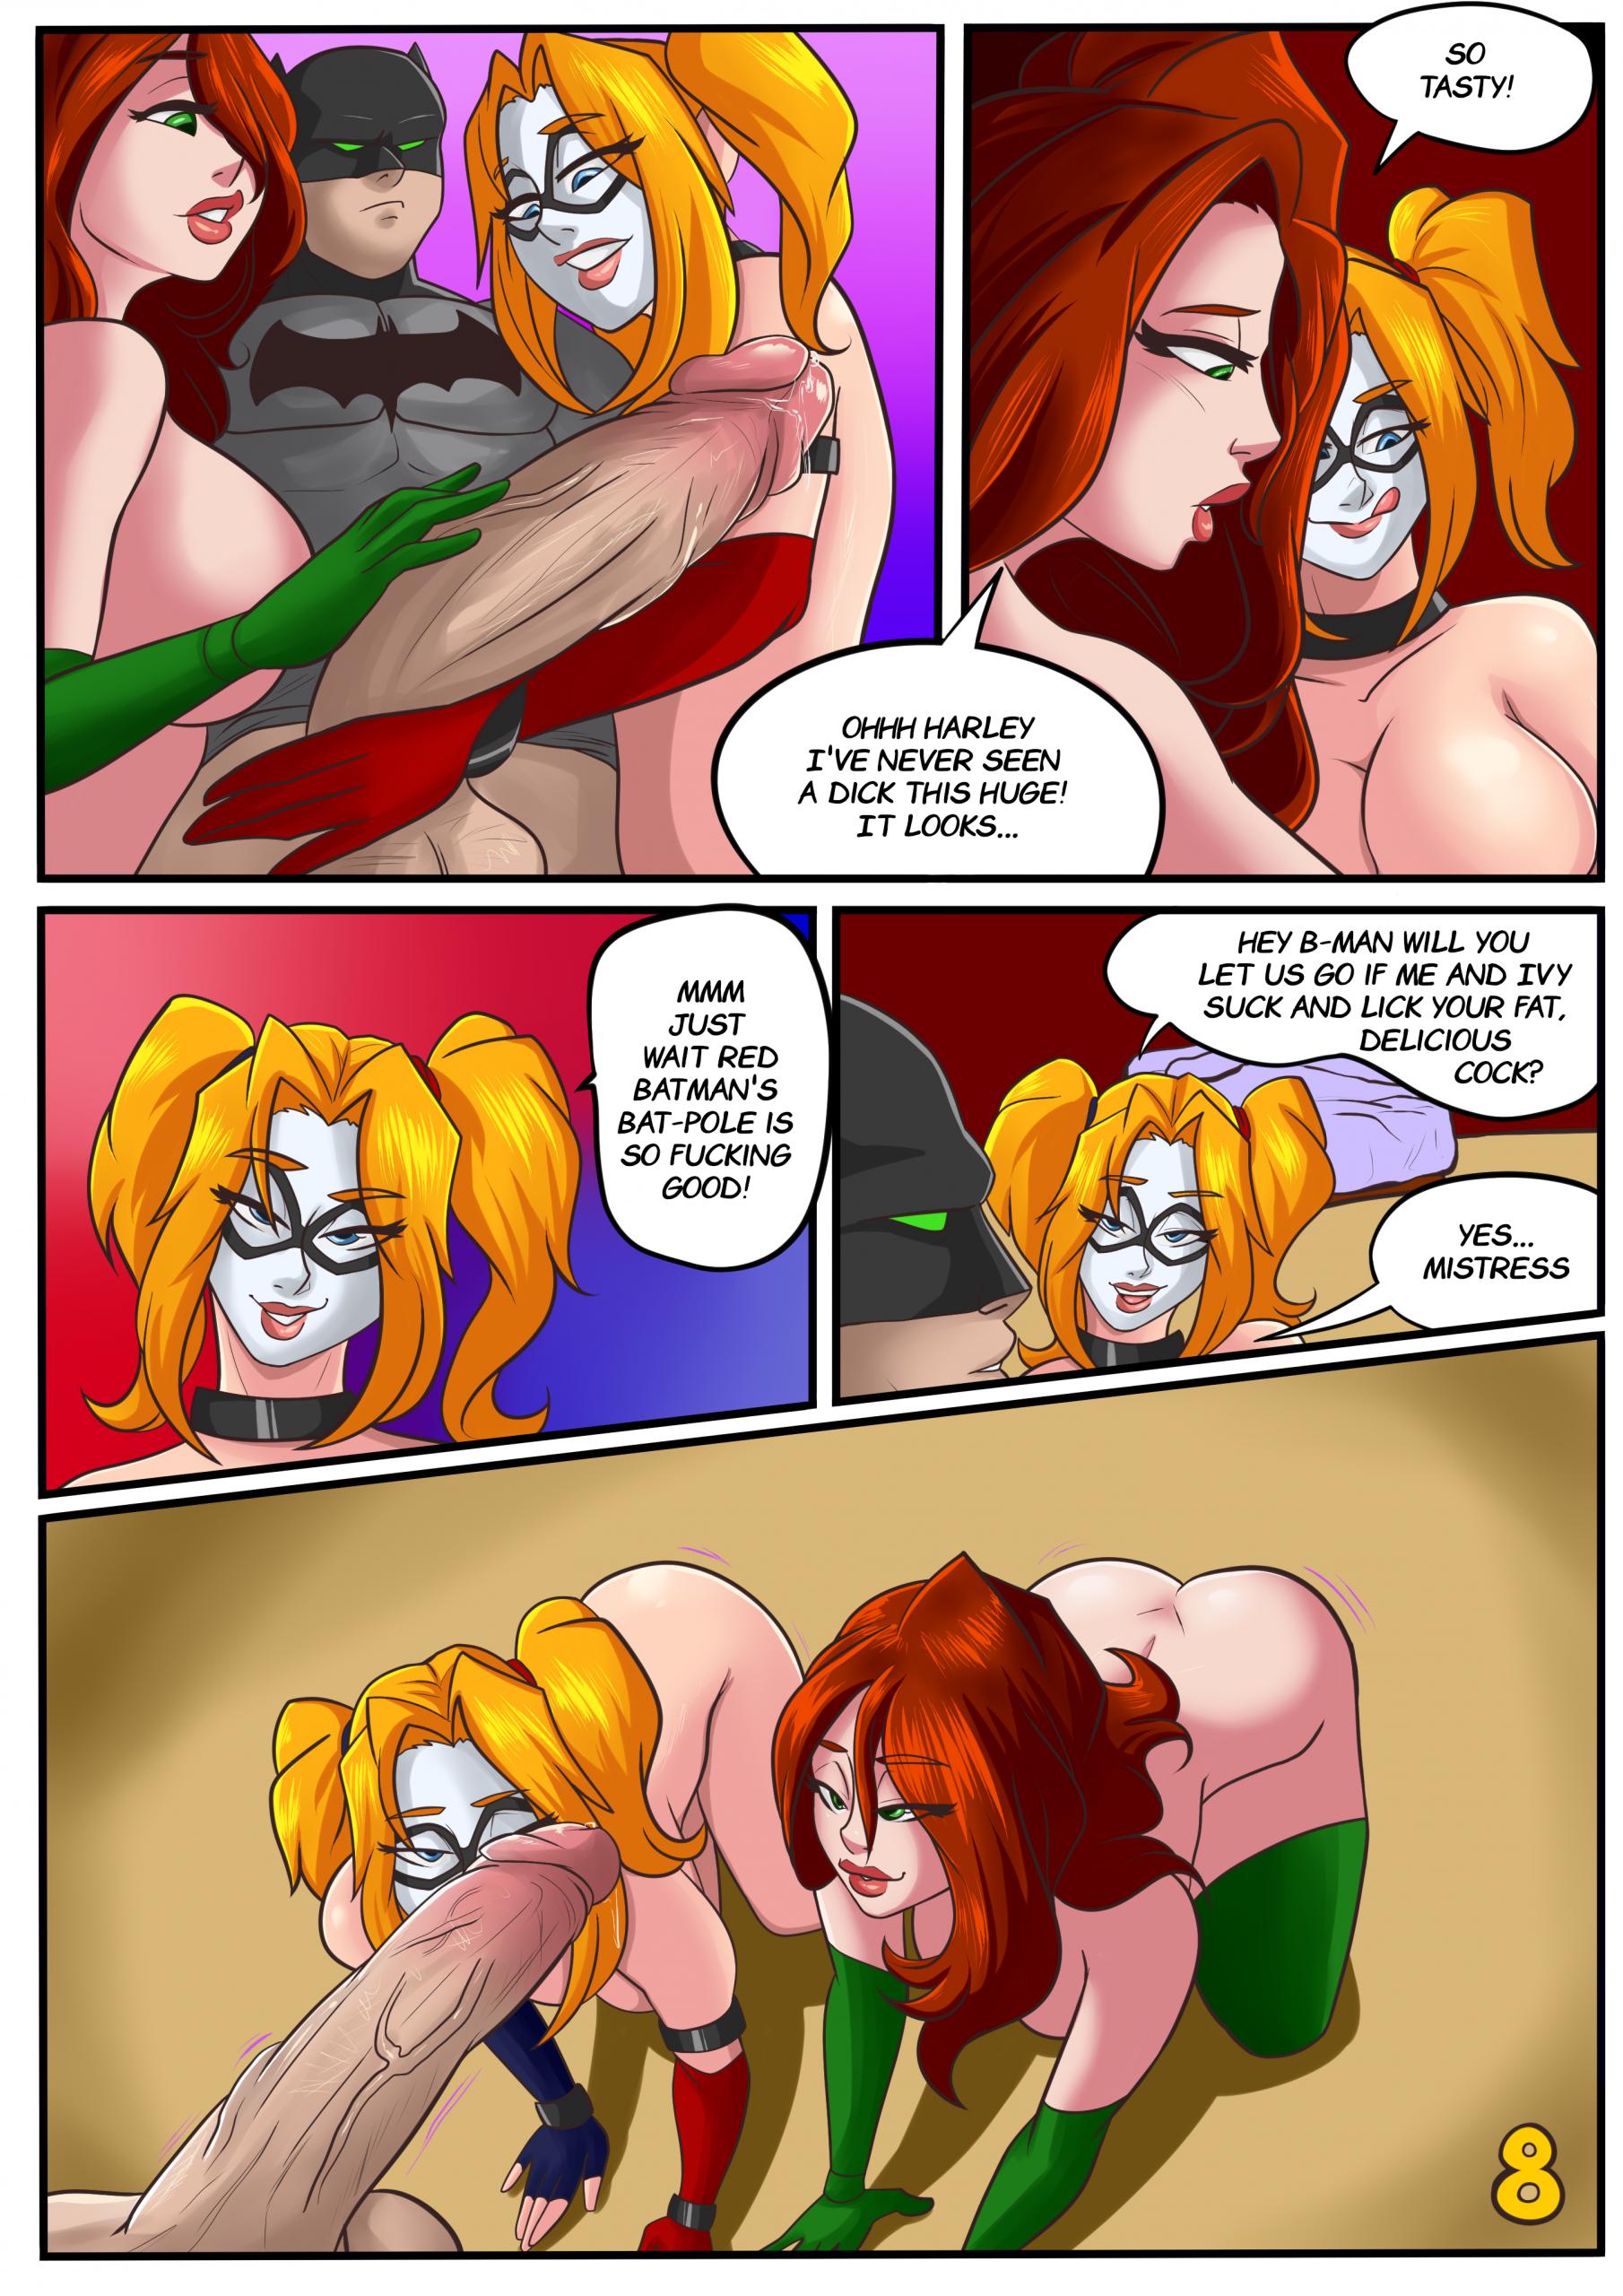 The Sexy Joke 2 porn comics Oral sex, Big Tits, Blowjob, Group Sex, Lesbians, Stockings